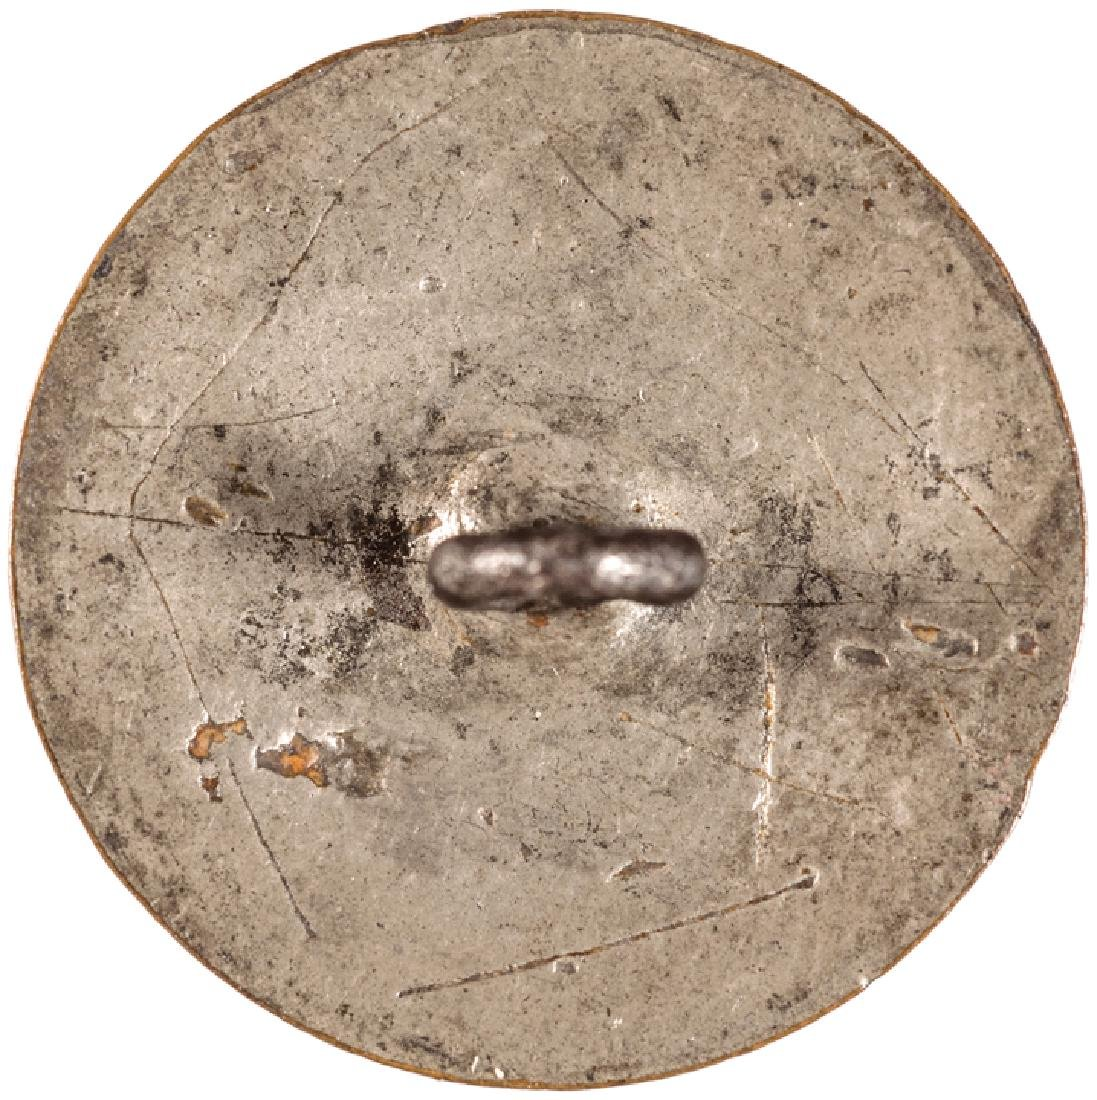 (1789) GENERAL WASHINGTON - PATER PATRIAE Button! - 2